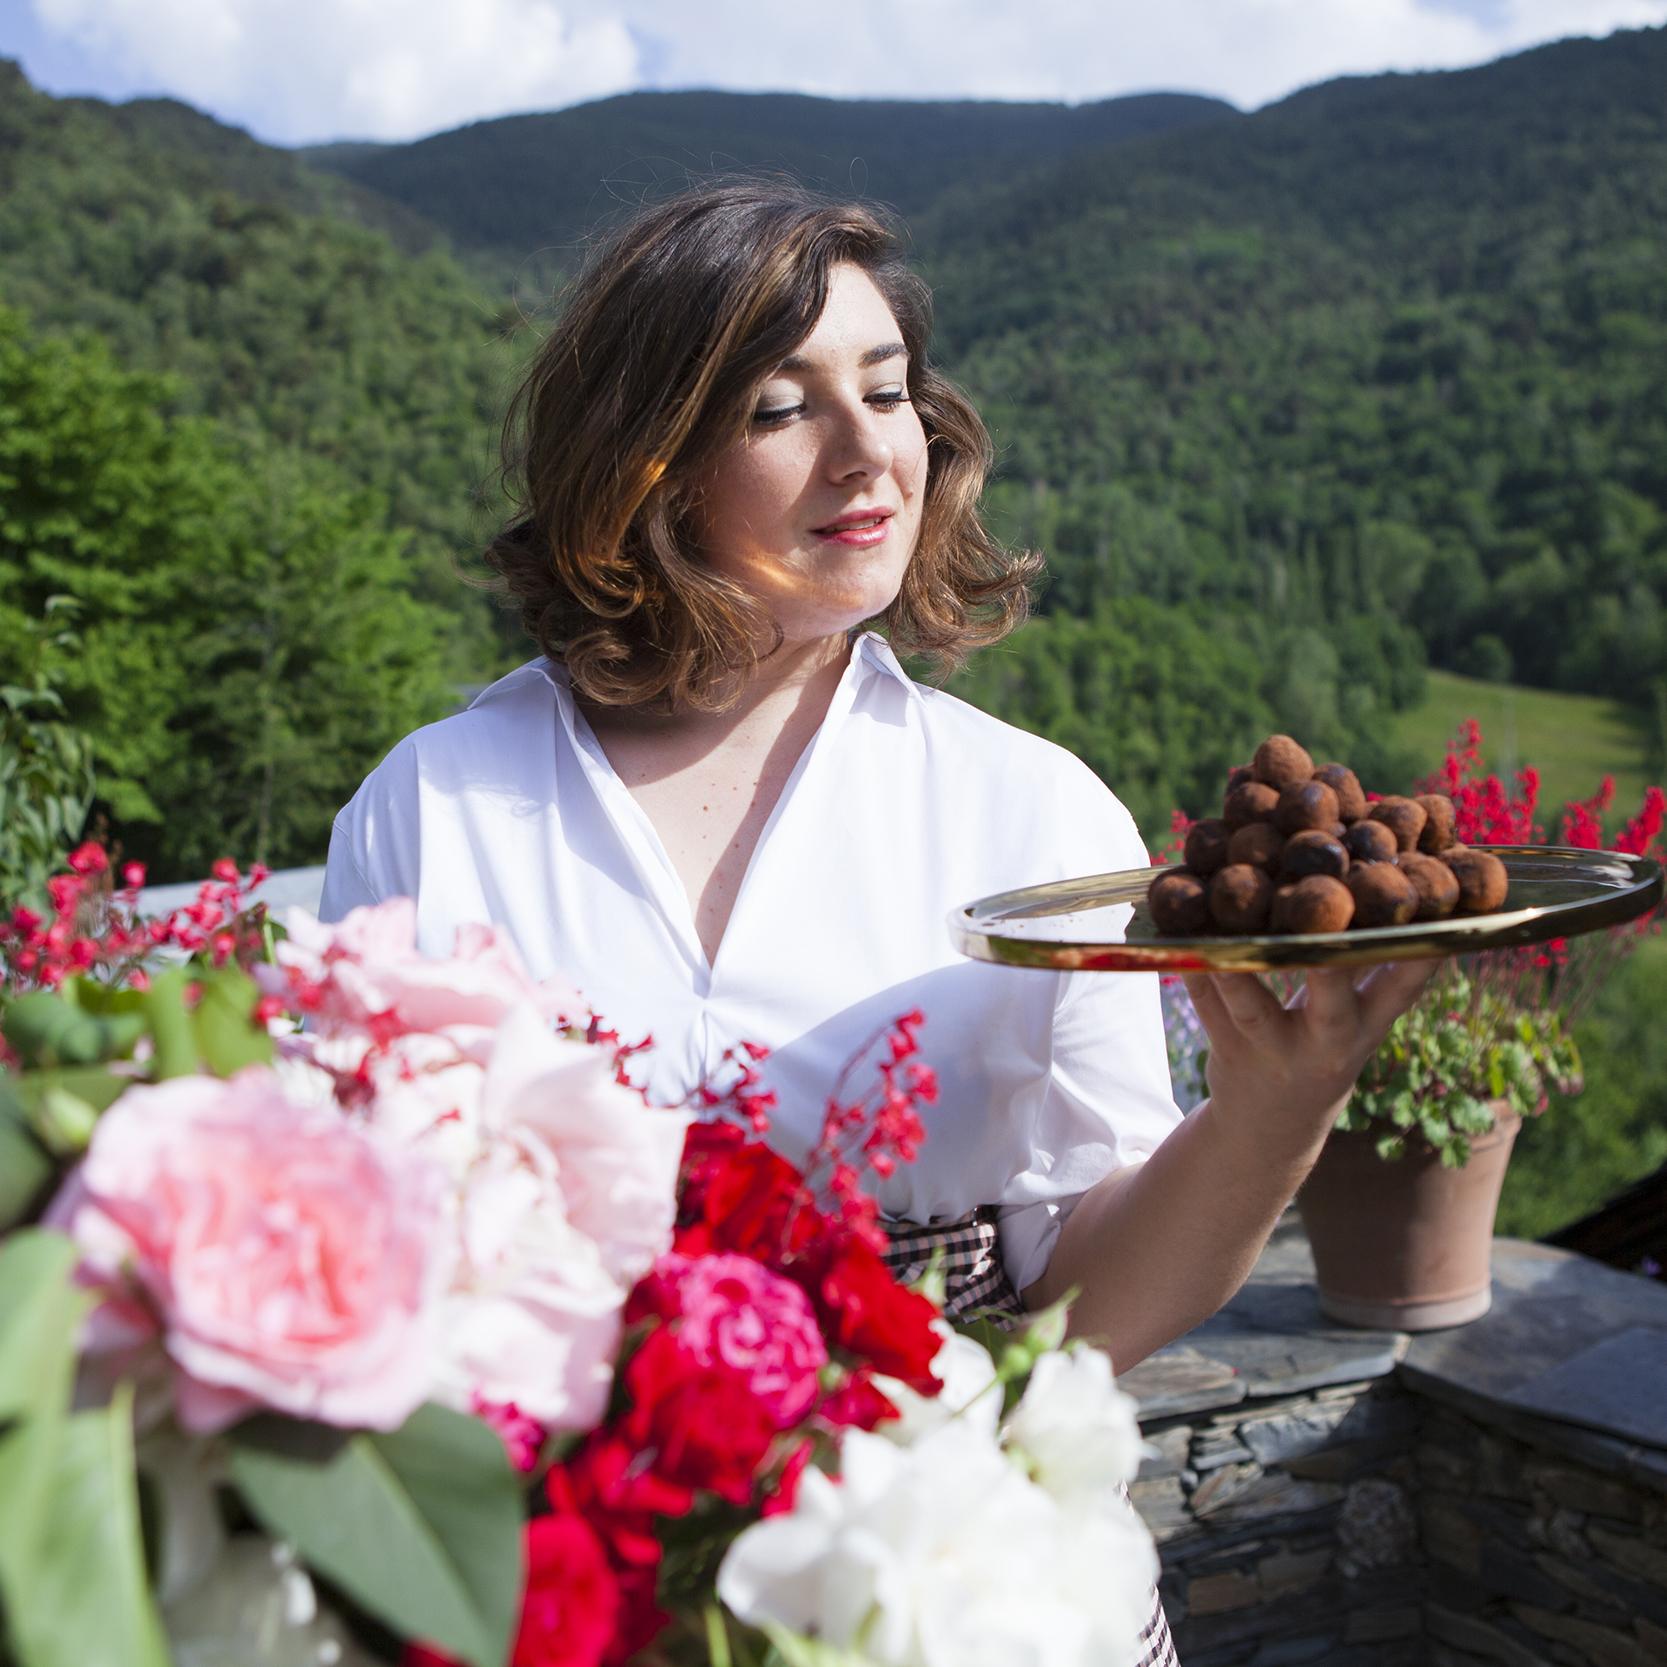 Sita Brown - Paestry Chef